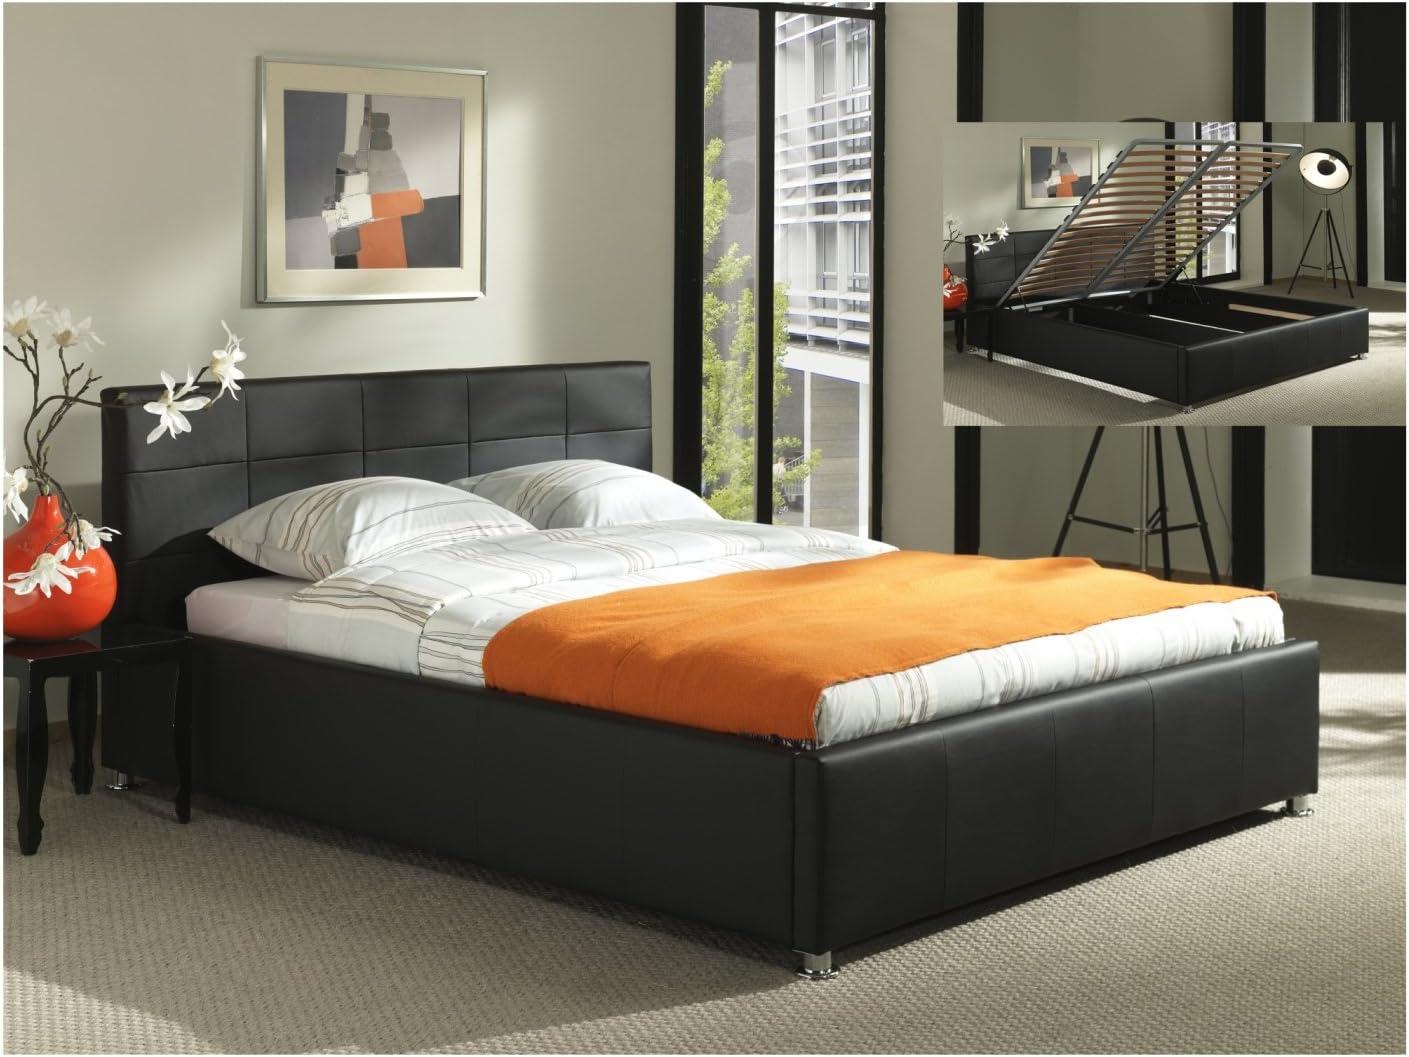 Cama baúl Negro + somier abatibles 140 x 200 cm Flora ...